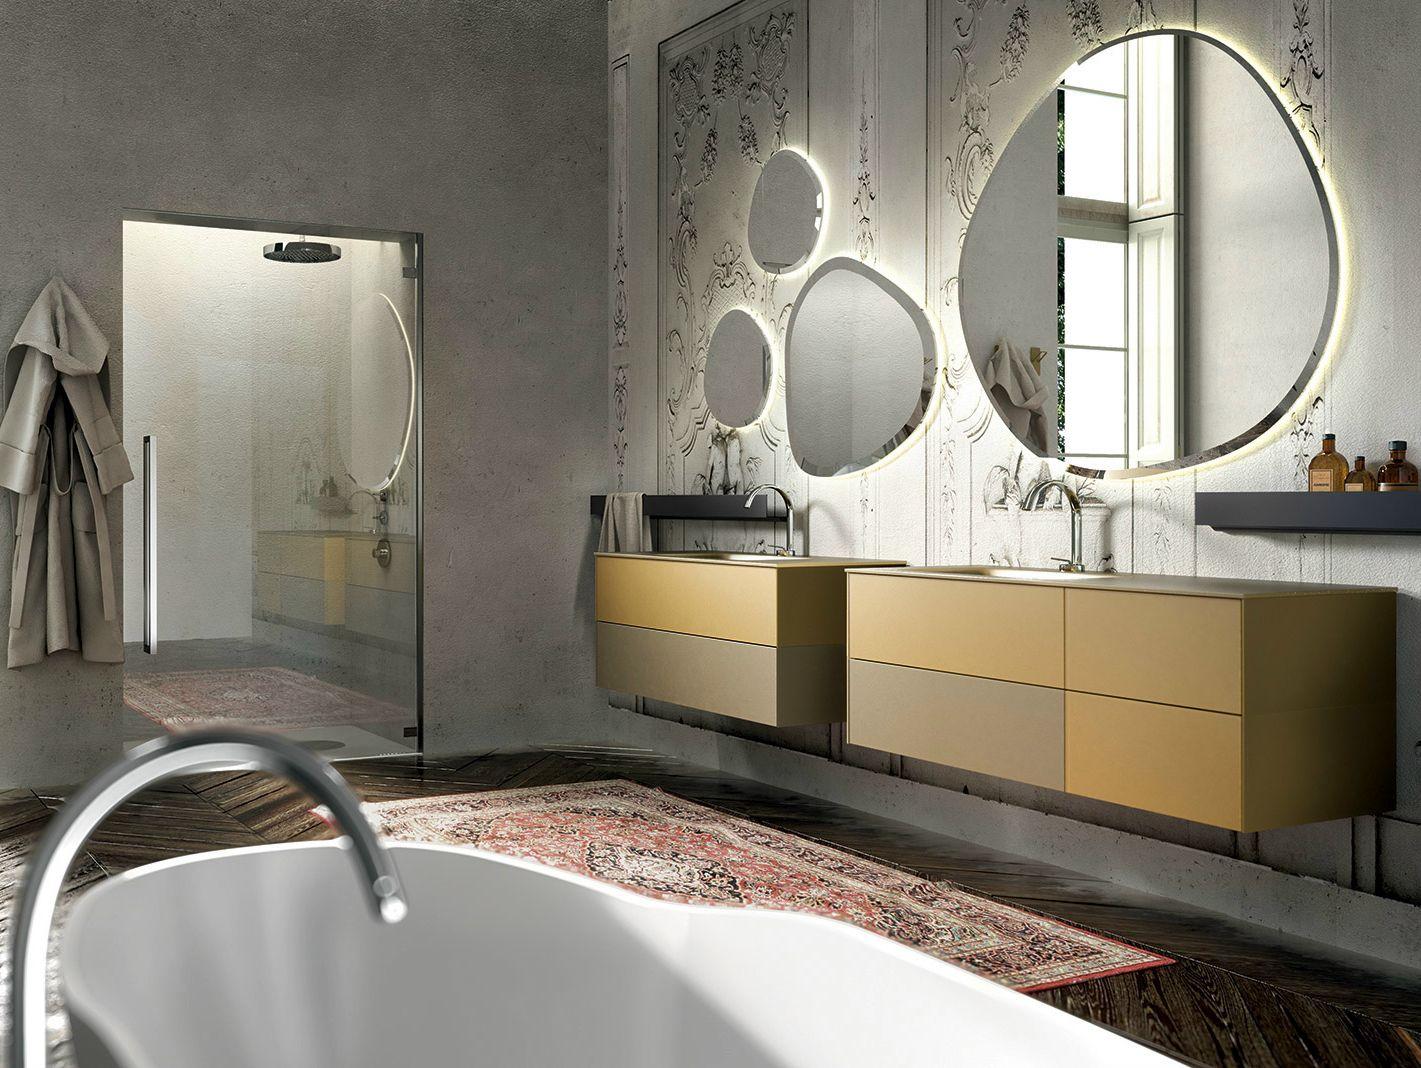 Mobile lavabo sospeso in vetro sabbiato con specchio enea 314 by edon by agor group - Agora mobili bagno ...